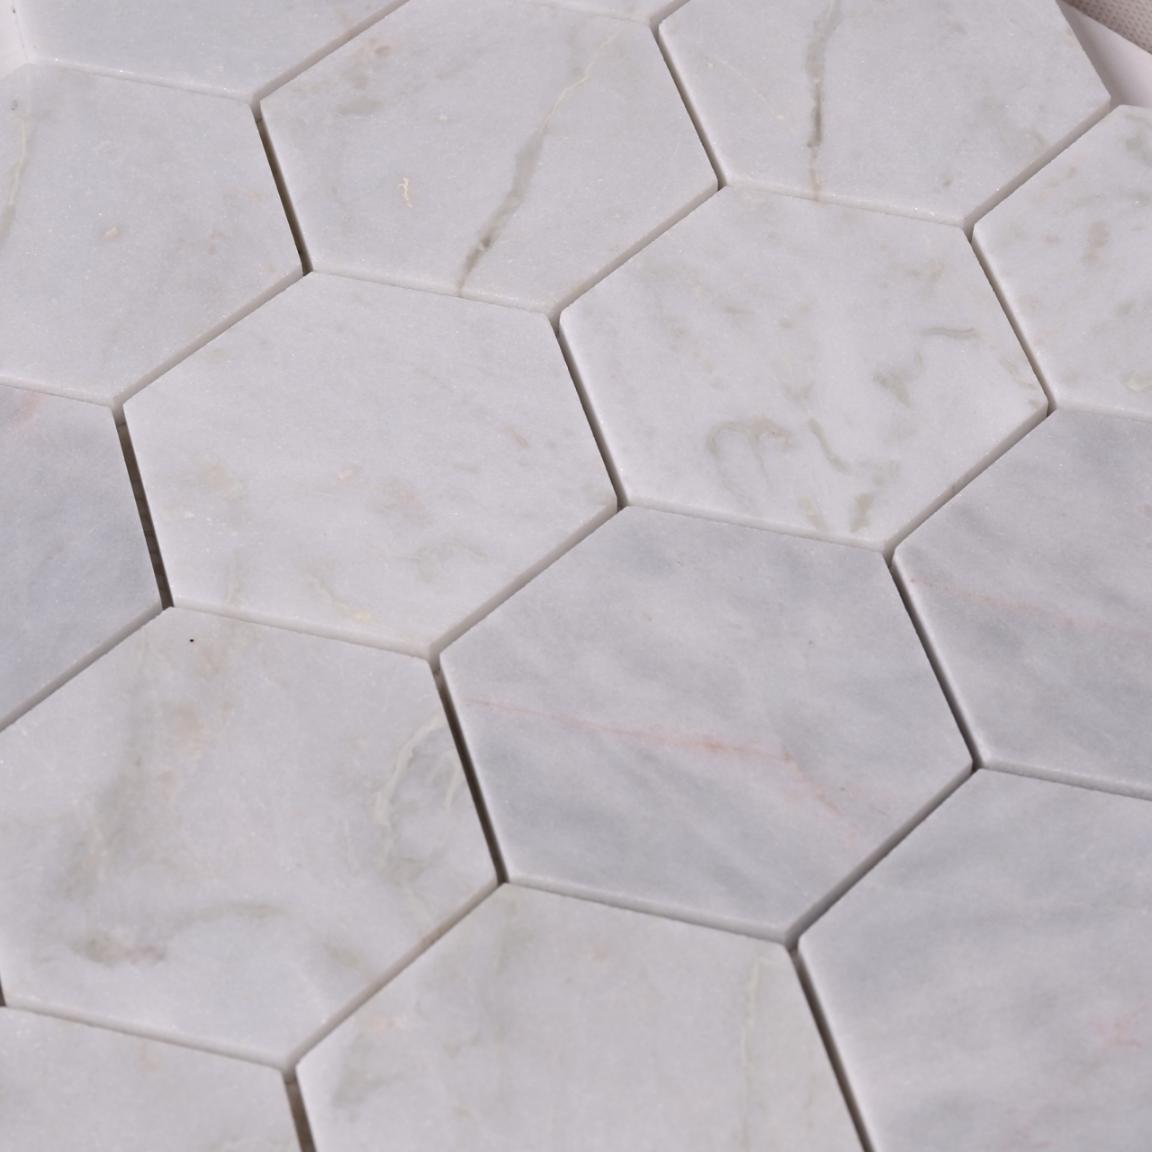 news-Heng Xing-Heng Xing golden mosaic tile art Suppliers for bathroom-img